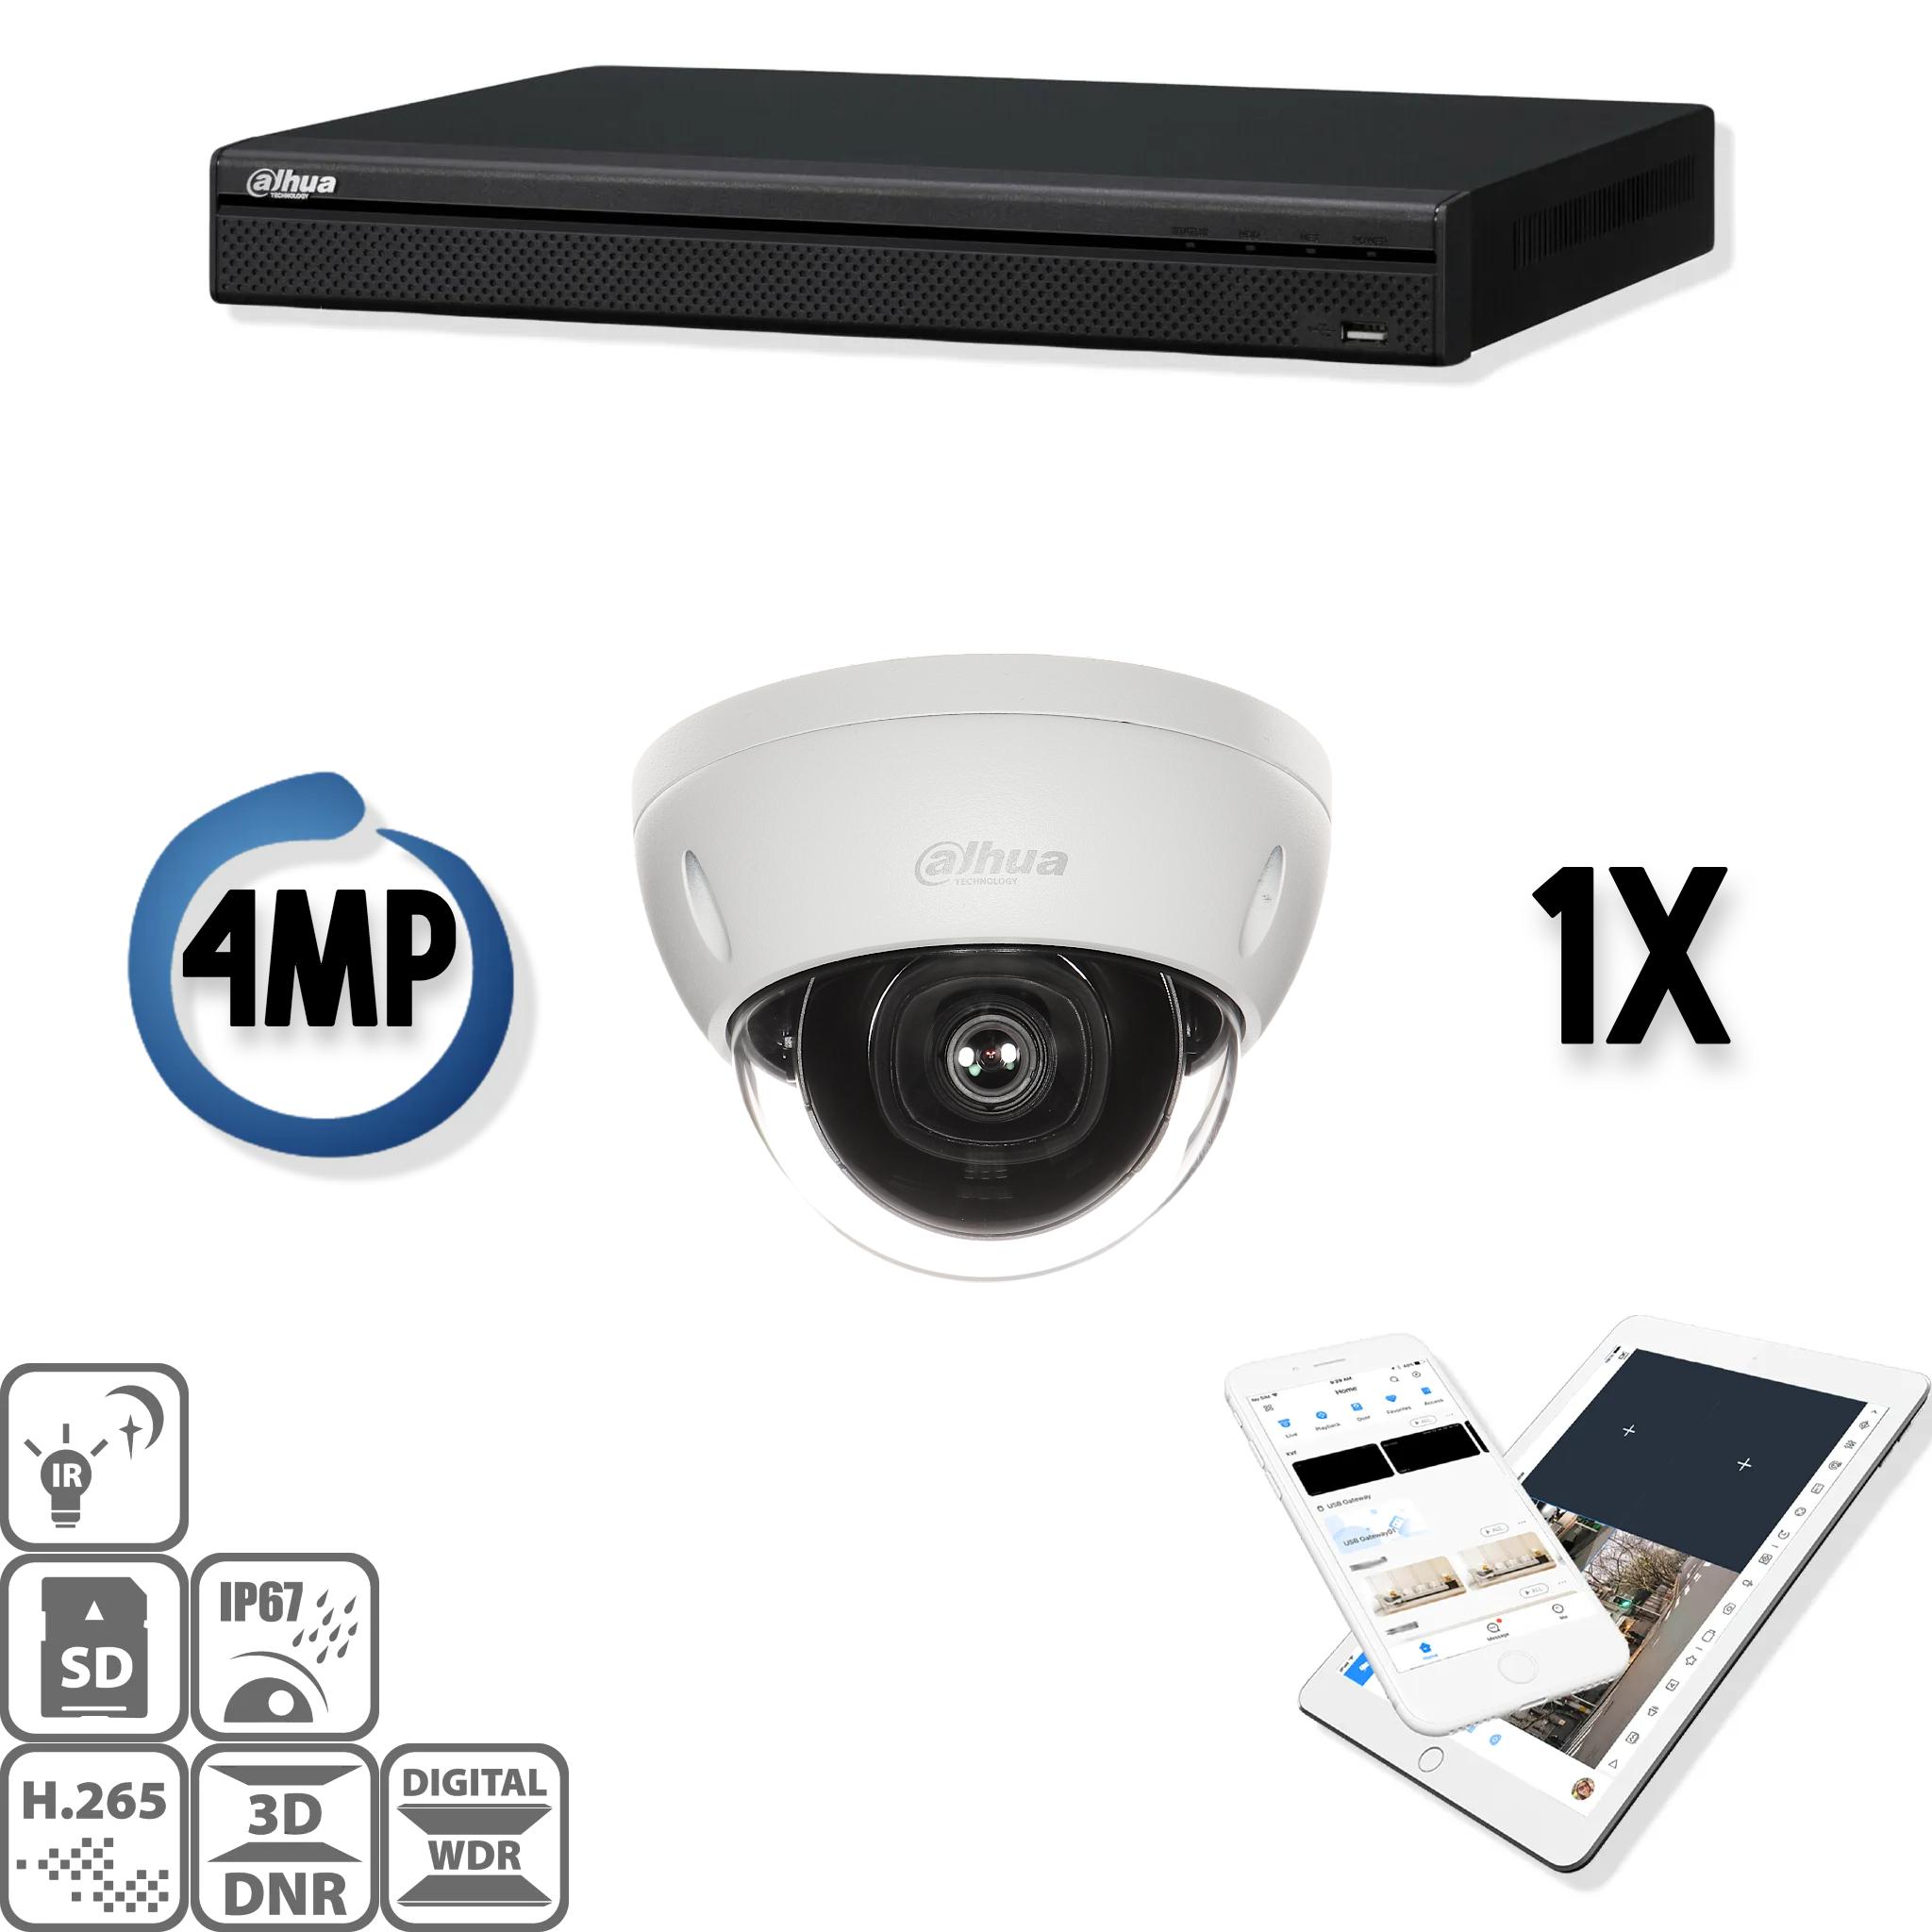 Kit Full HD IP 1x domo Conjunto de seguridad de cámara de 4 megapíxeles